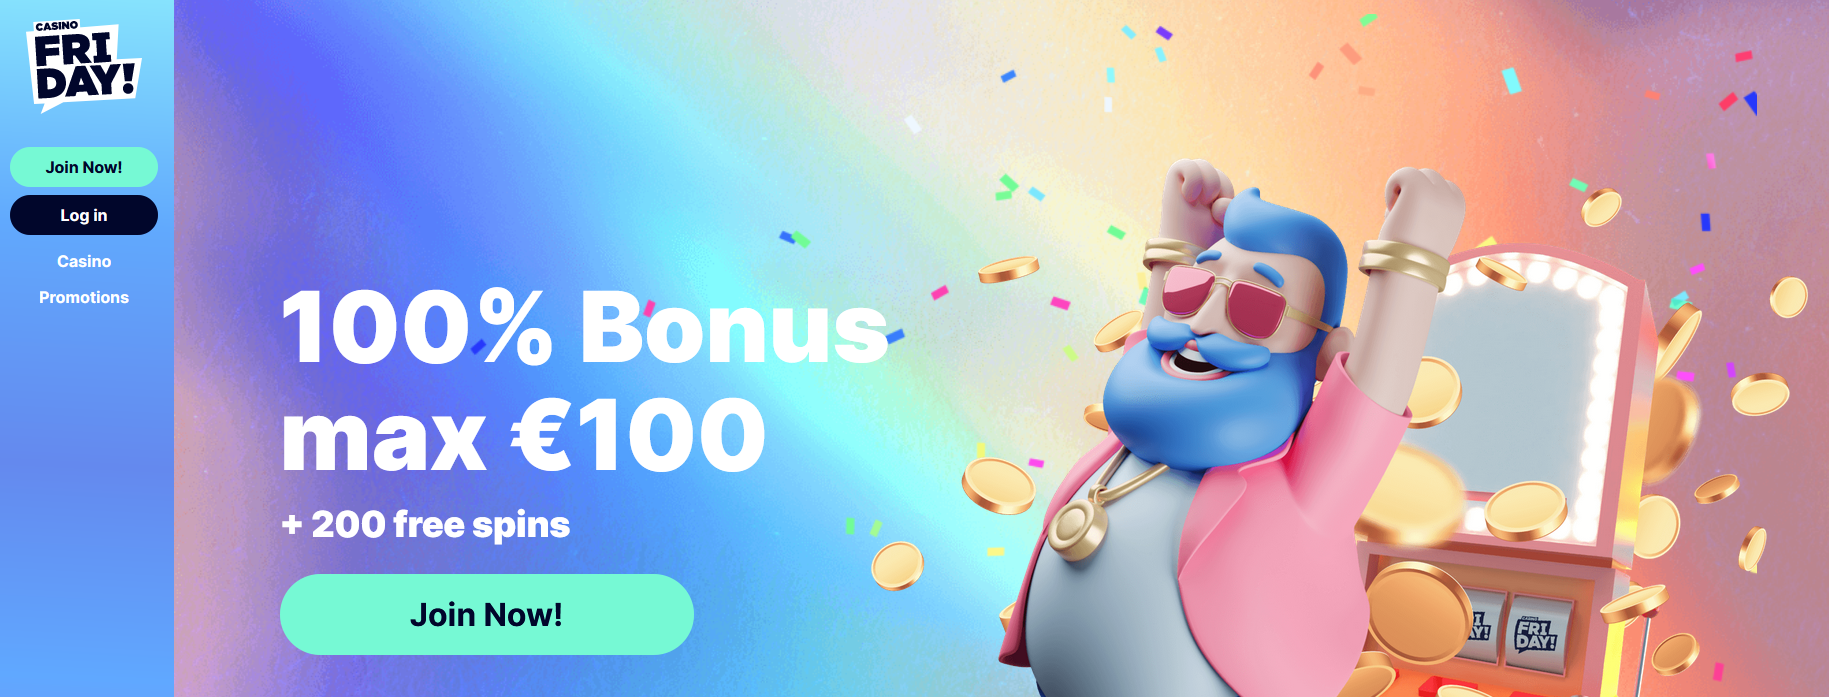 casinofriday_bonus